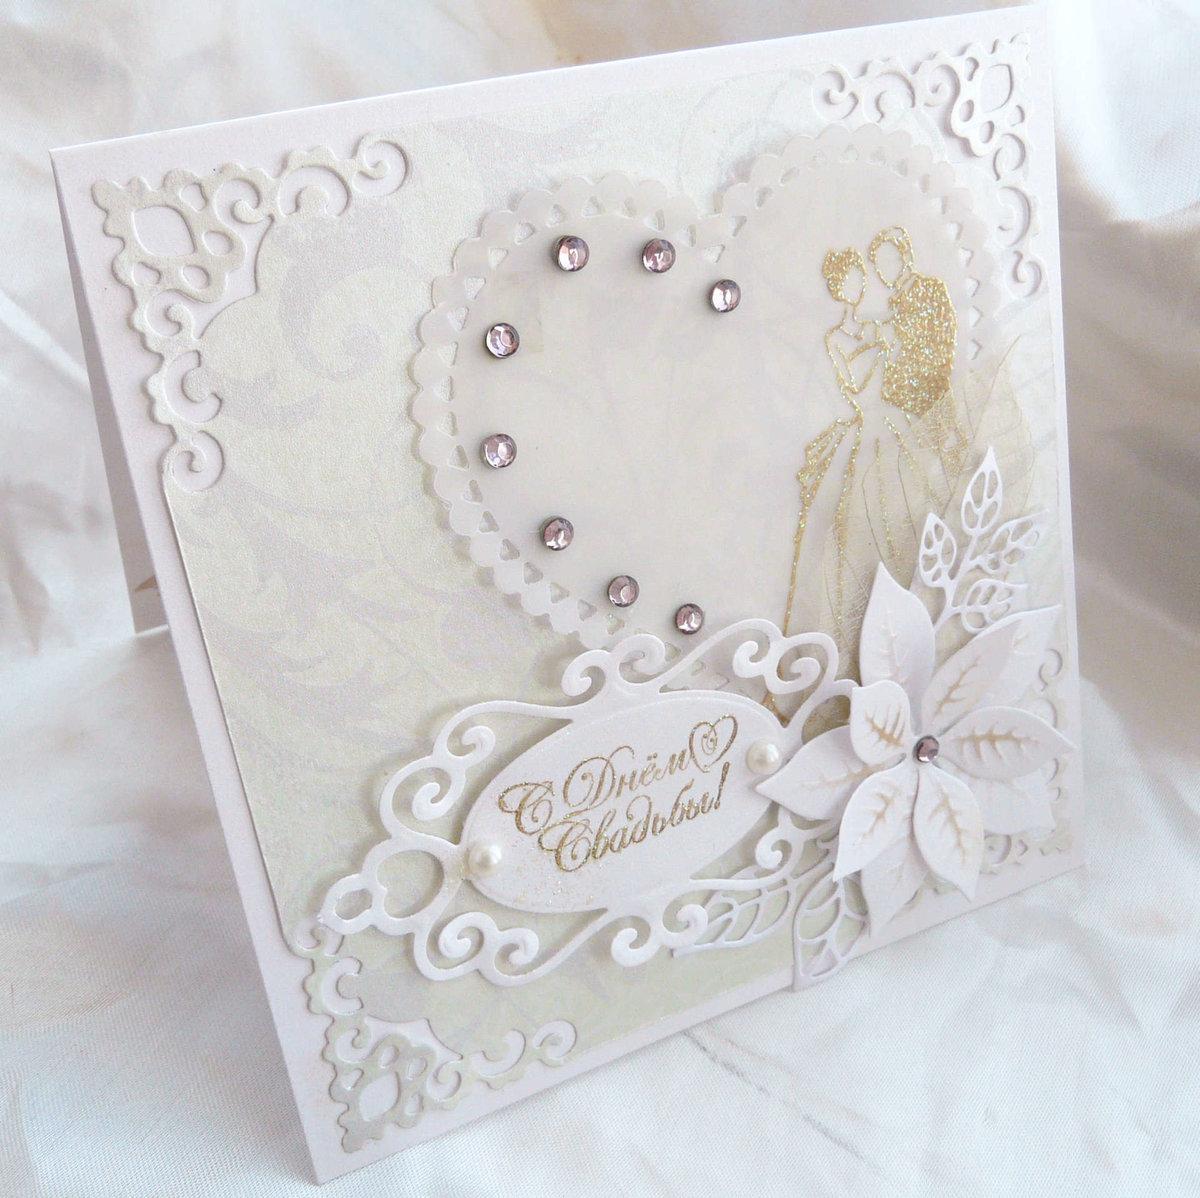 Для, бумажная свадьба скрапбукинг открытка